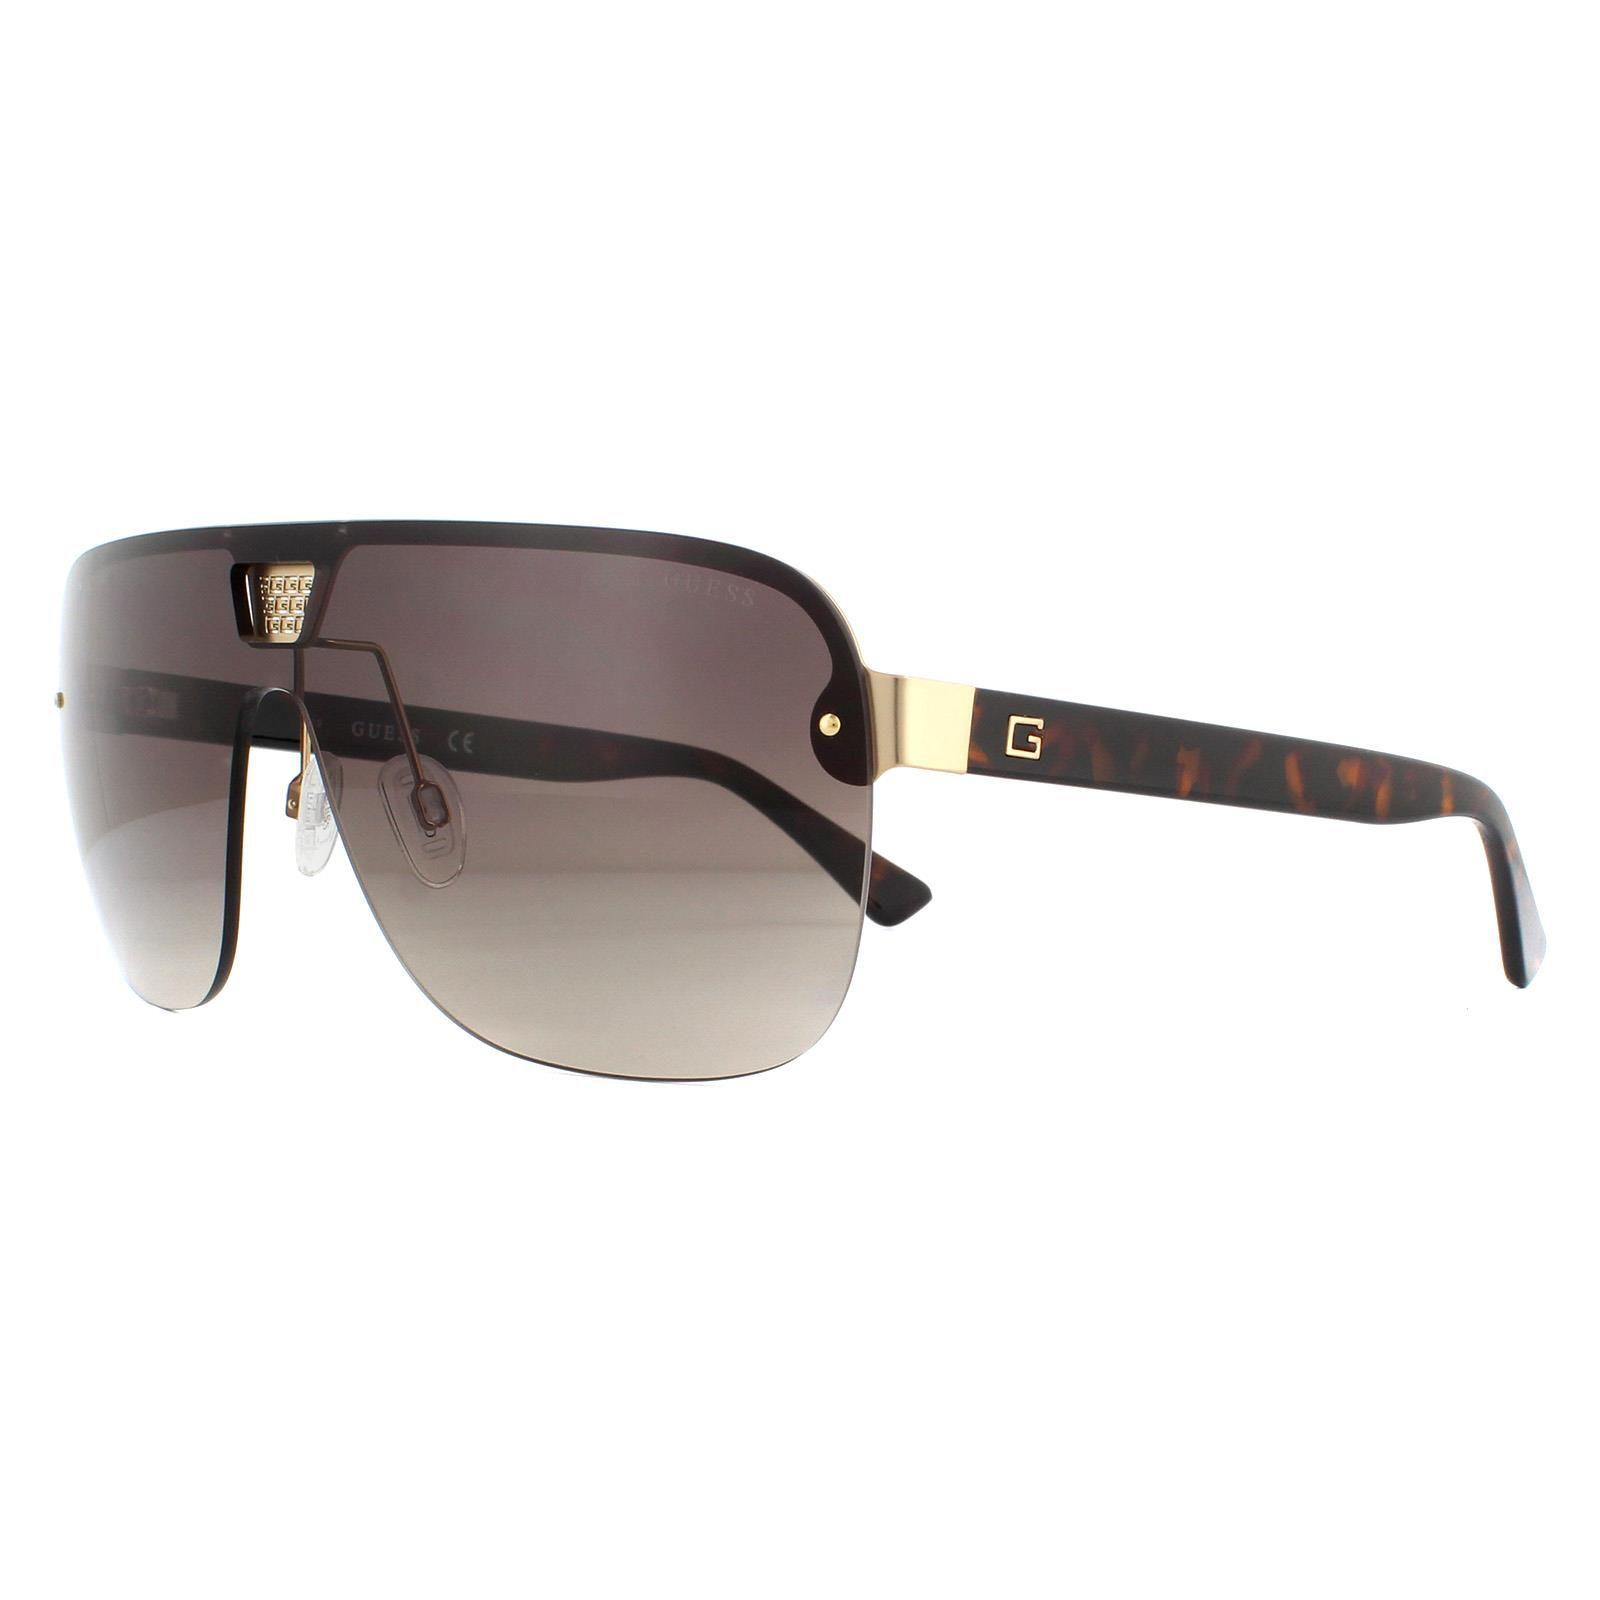 Guess Sunglasses GU6962 52F Dark Havana Brown